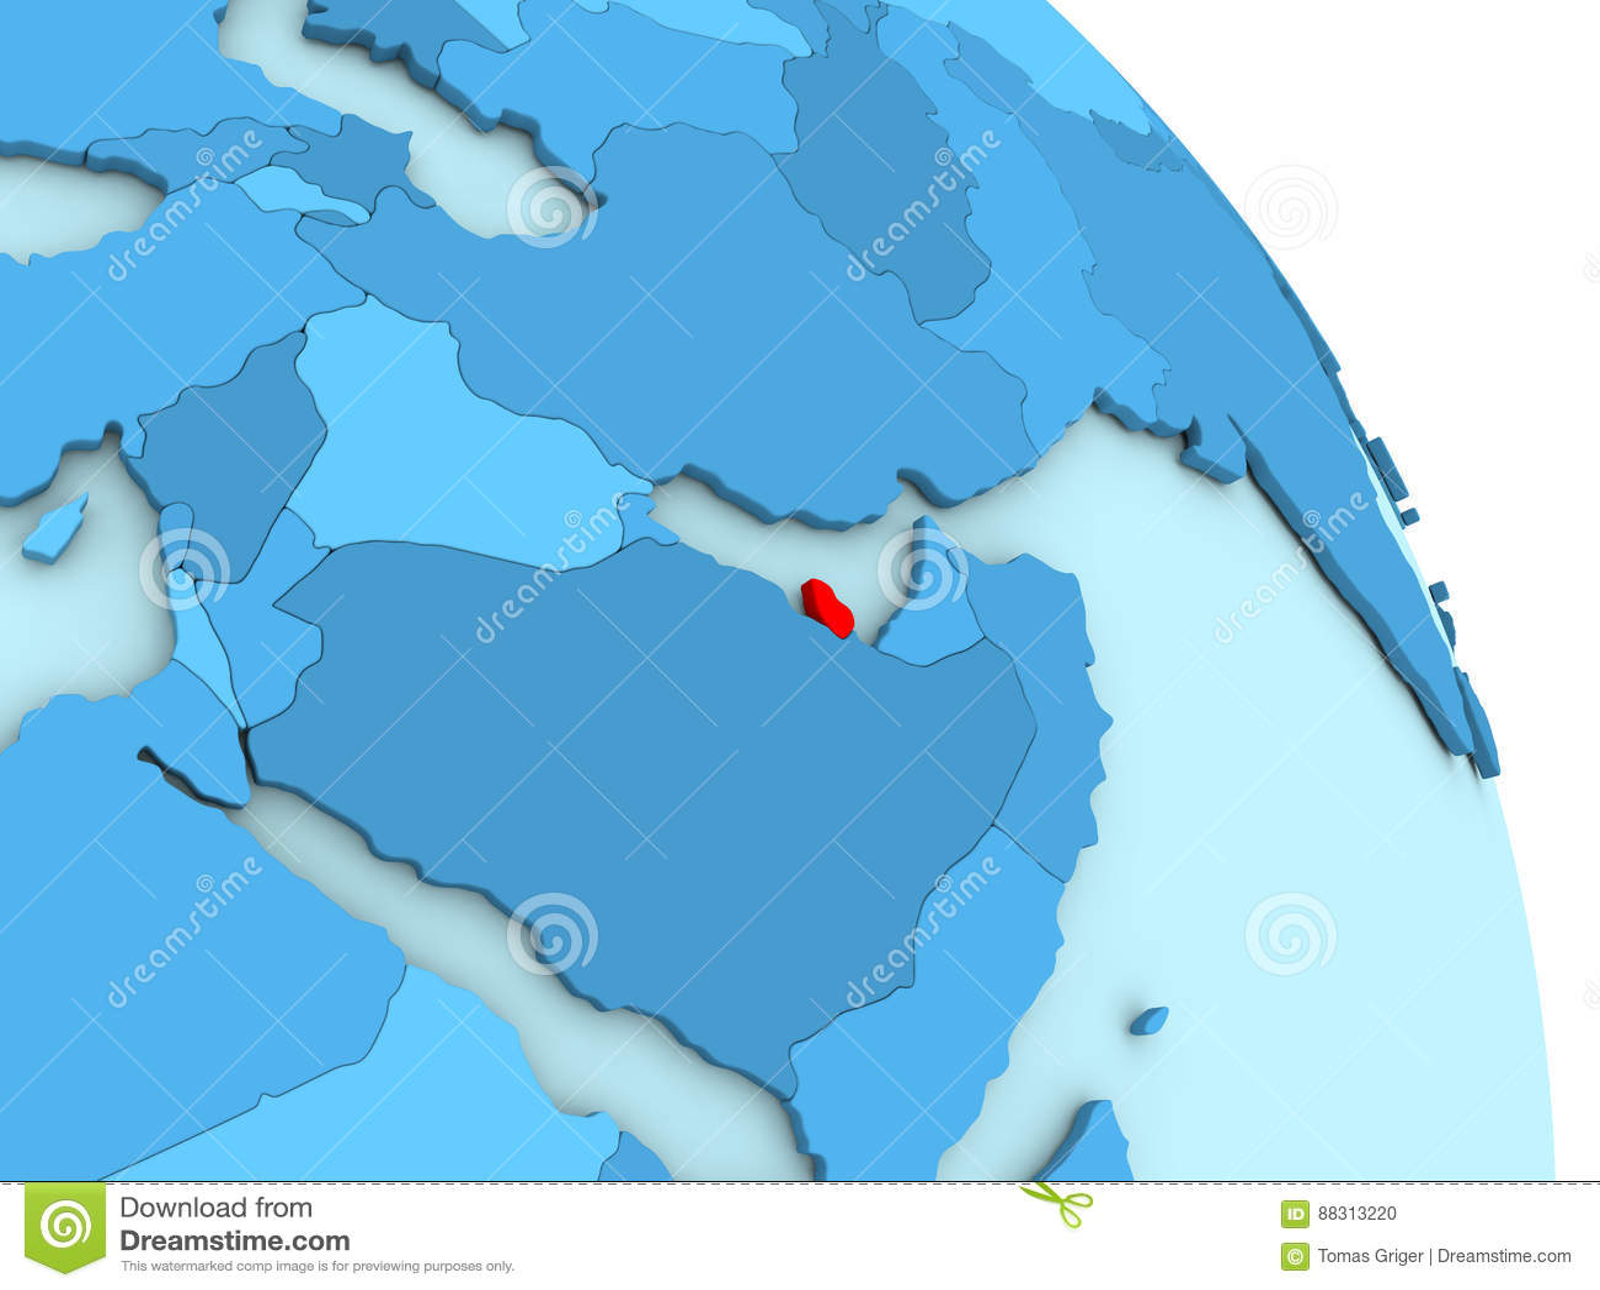 Gdy Francja Kicha Cala Europa Dostaje Kataru Marcin Siekanski Blog